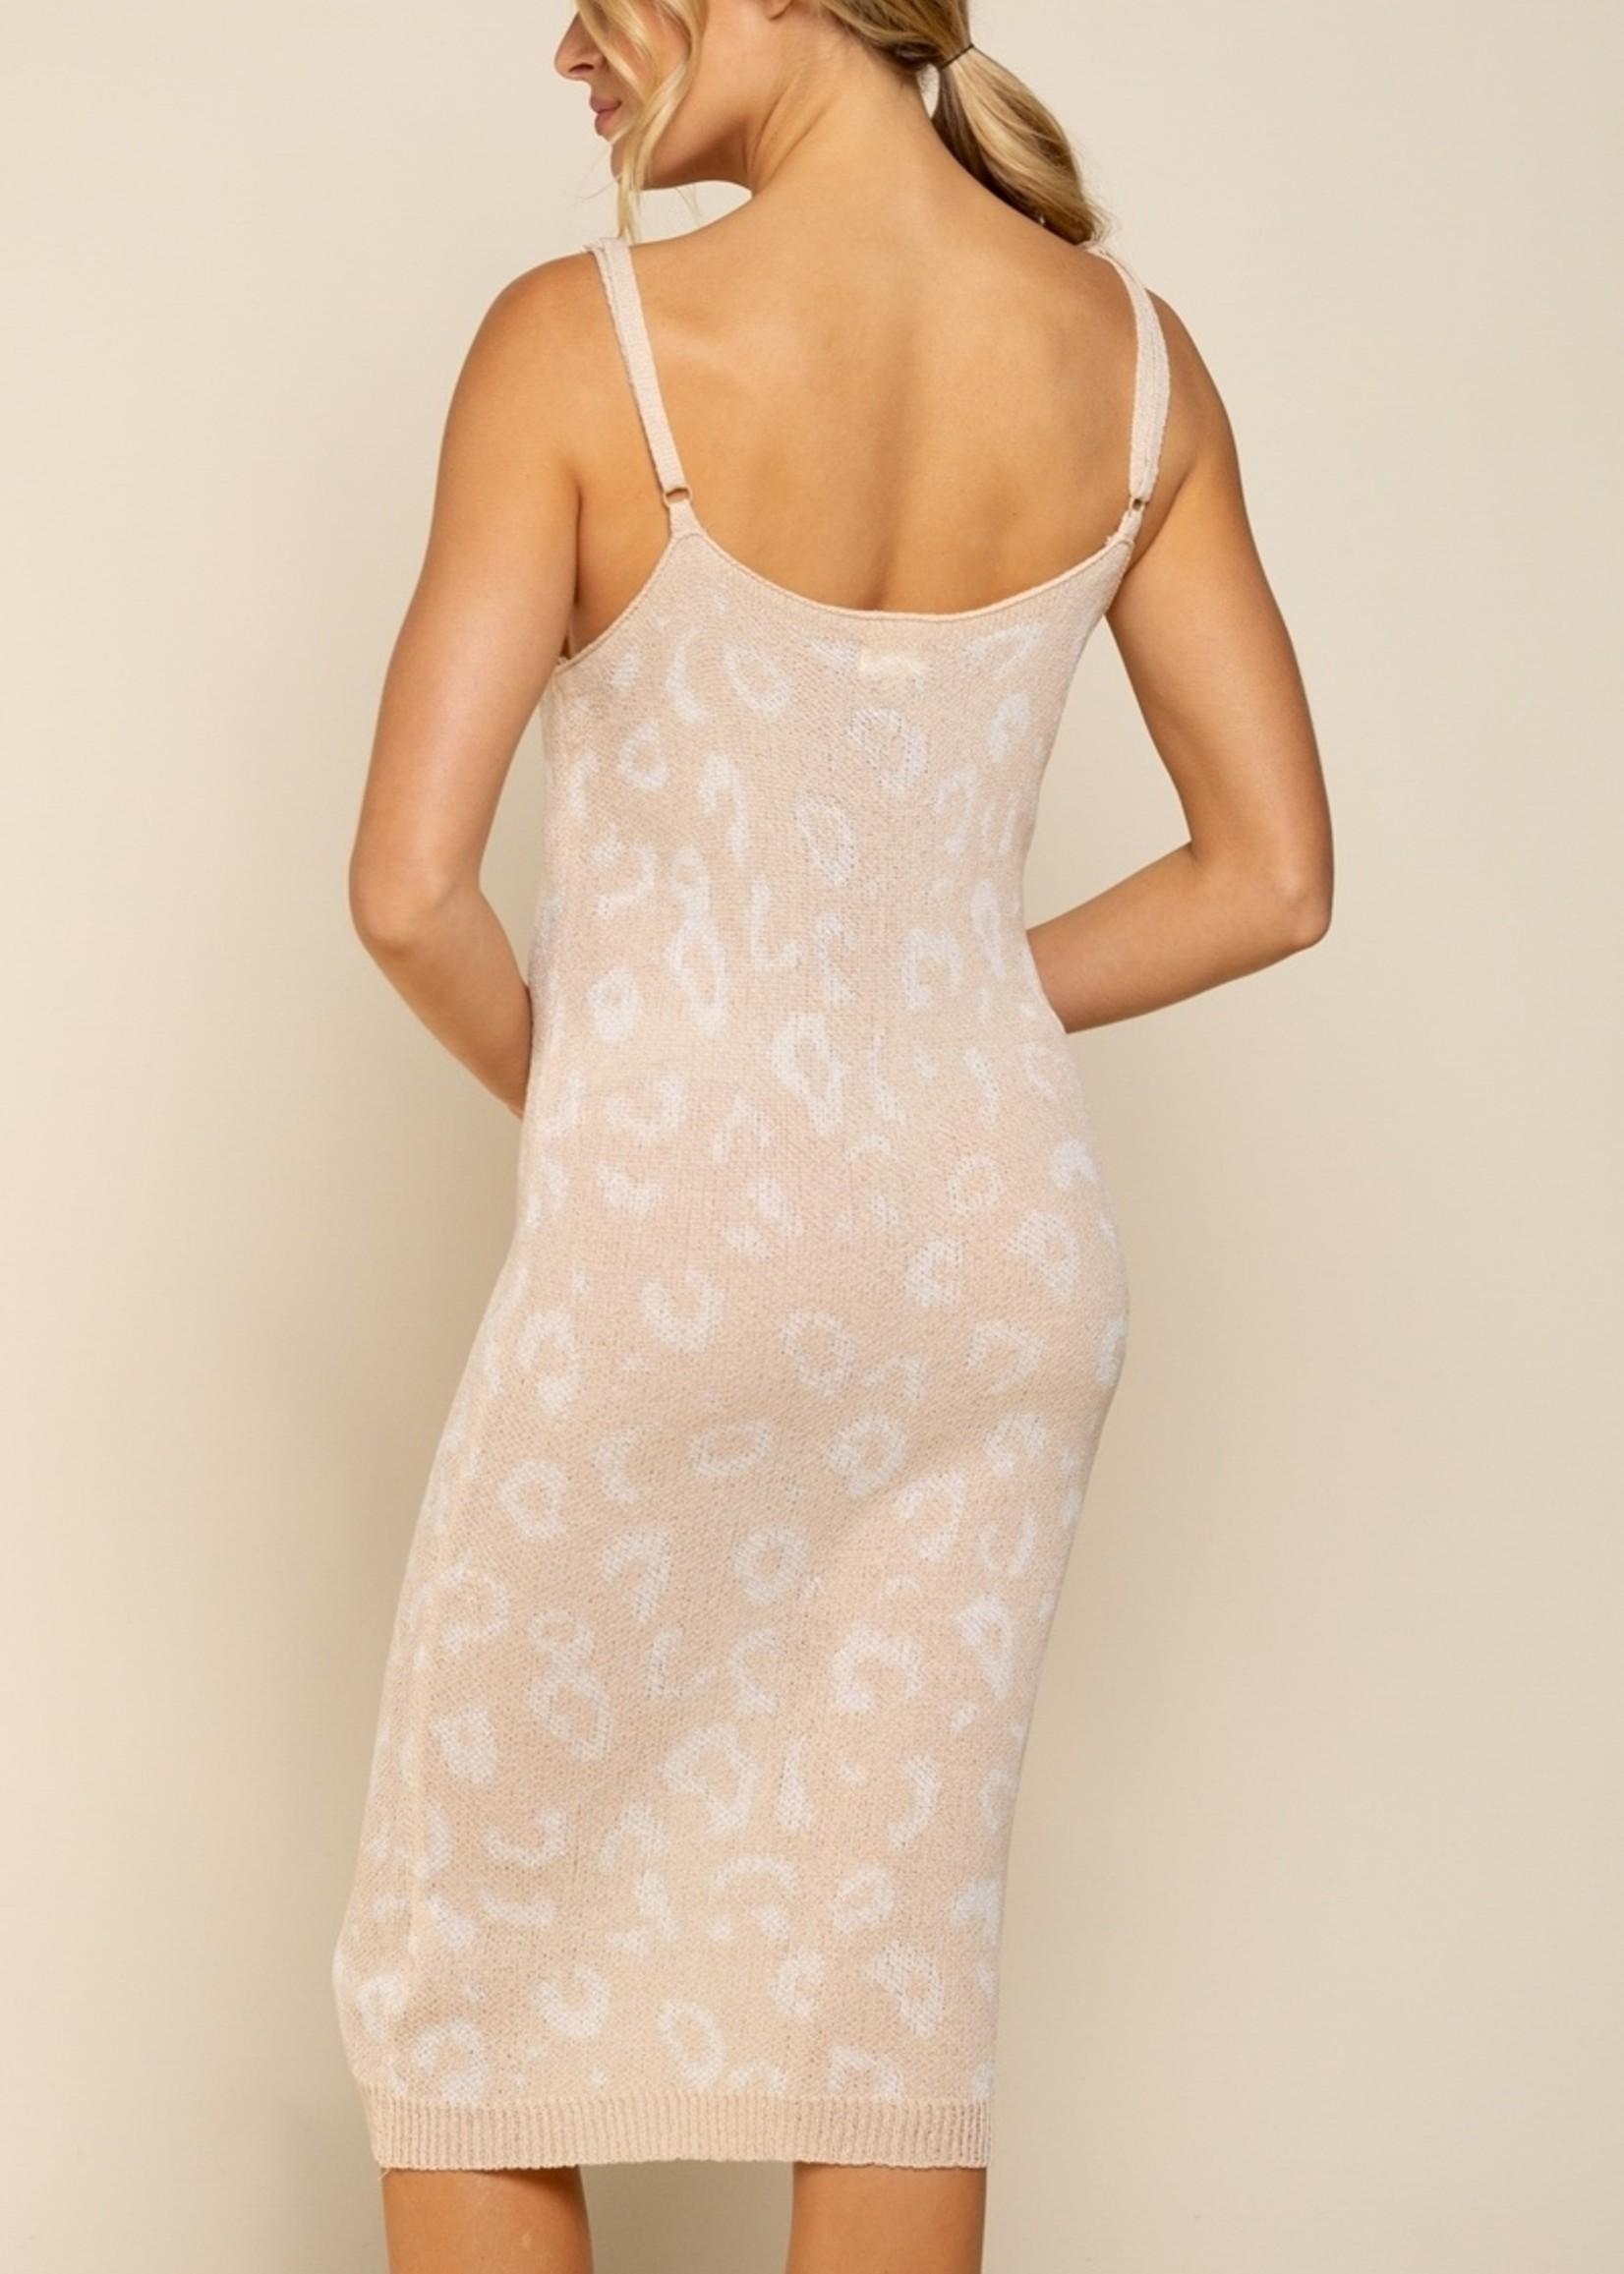 POL POL Knit Cream White Leopard Dress